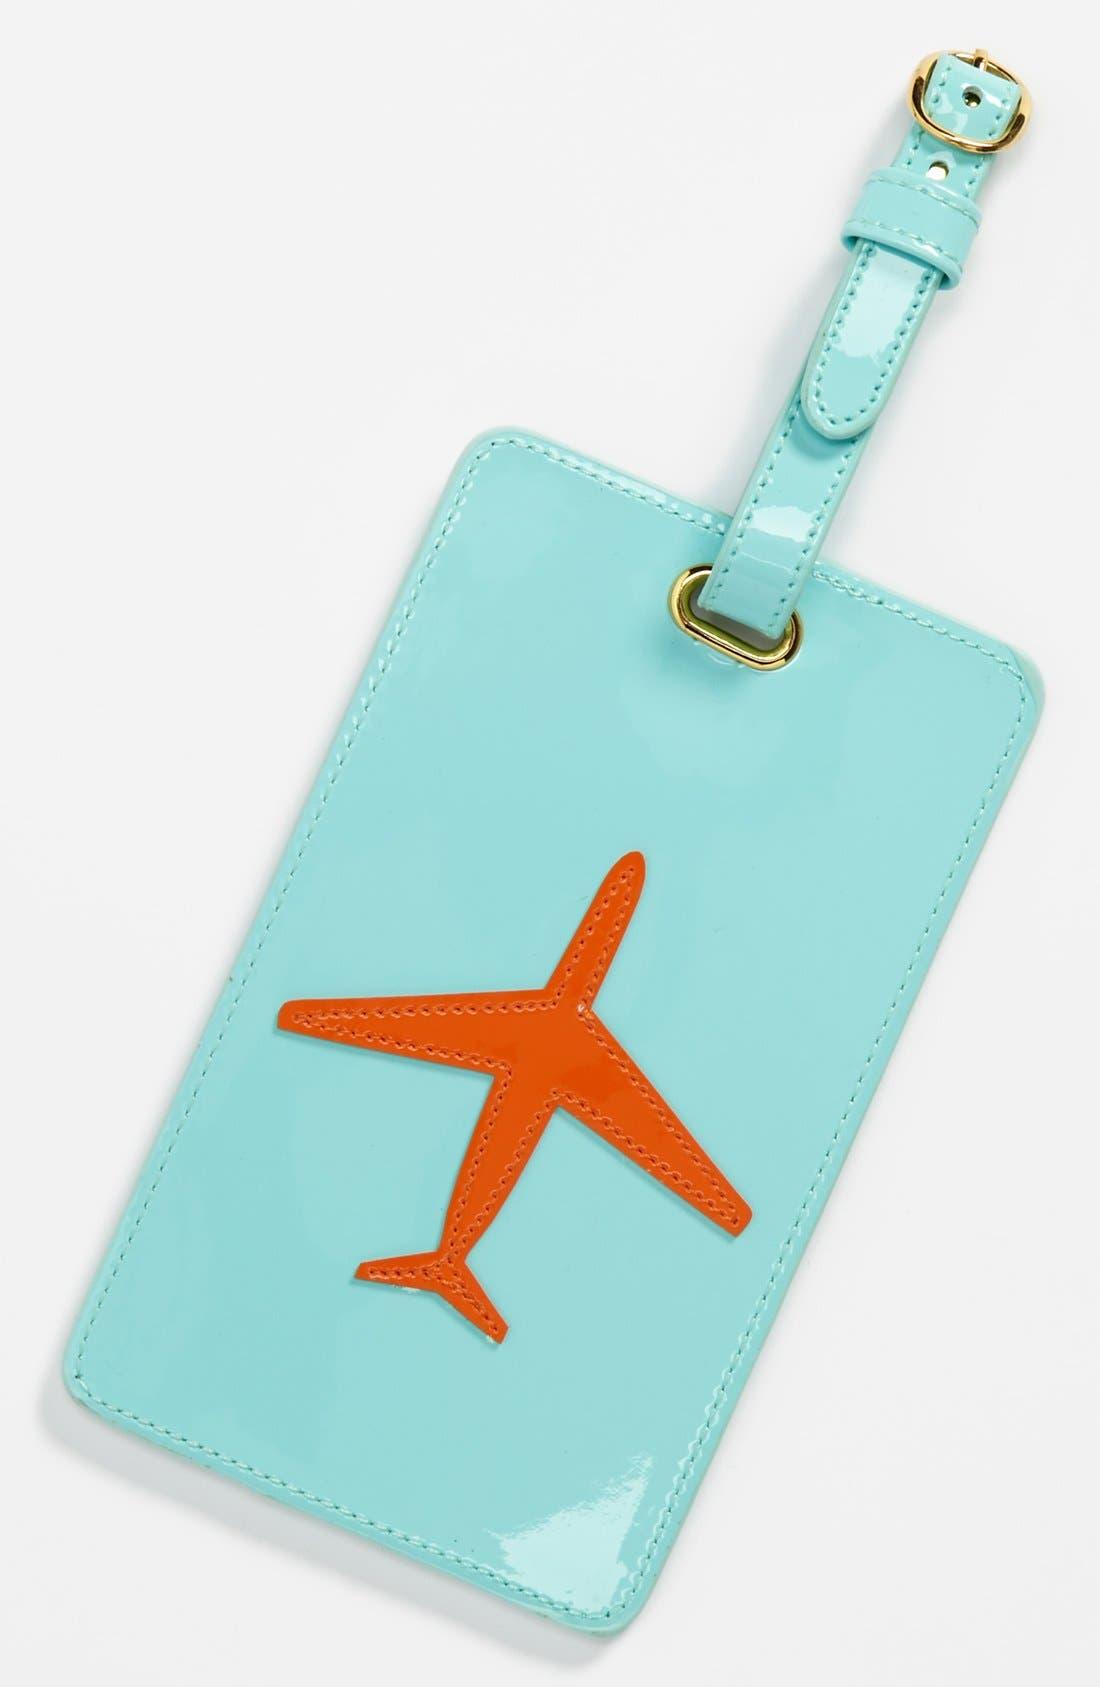 Main Image - Lolo 'Airplane' Luggage Tag